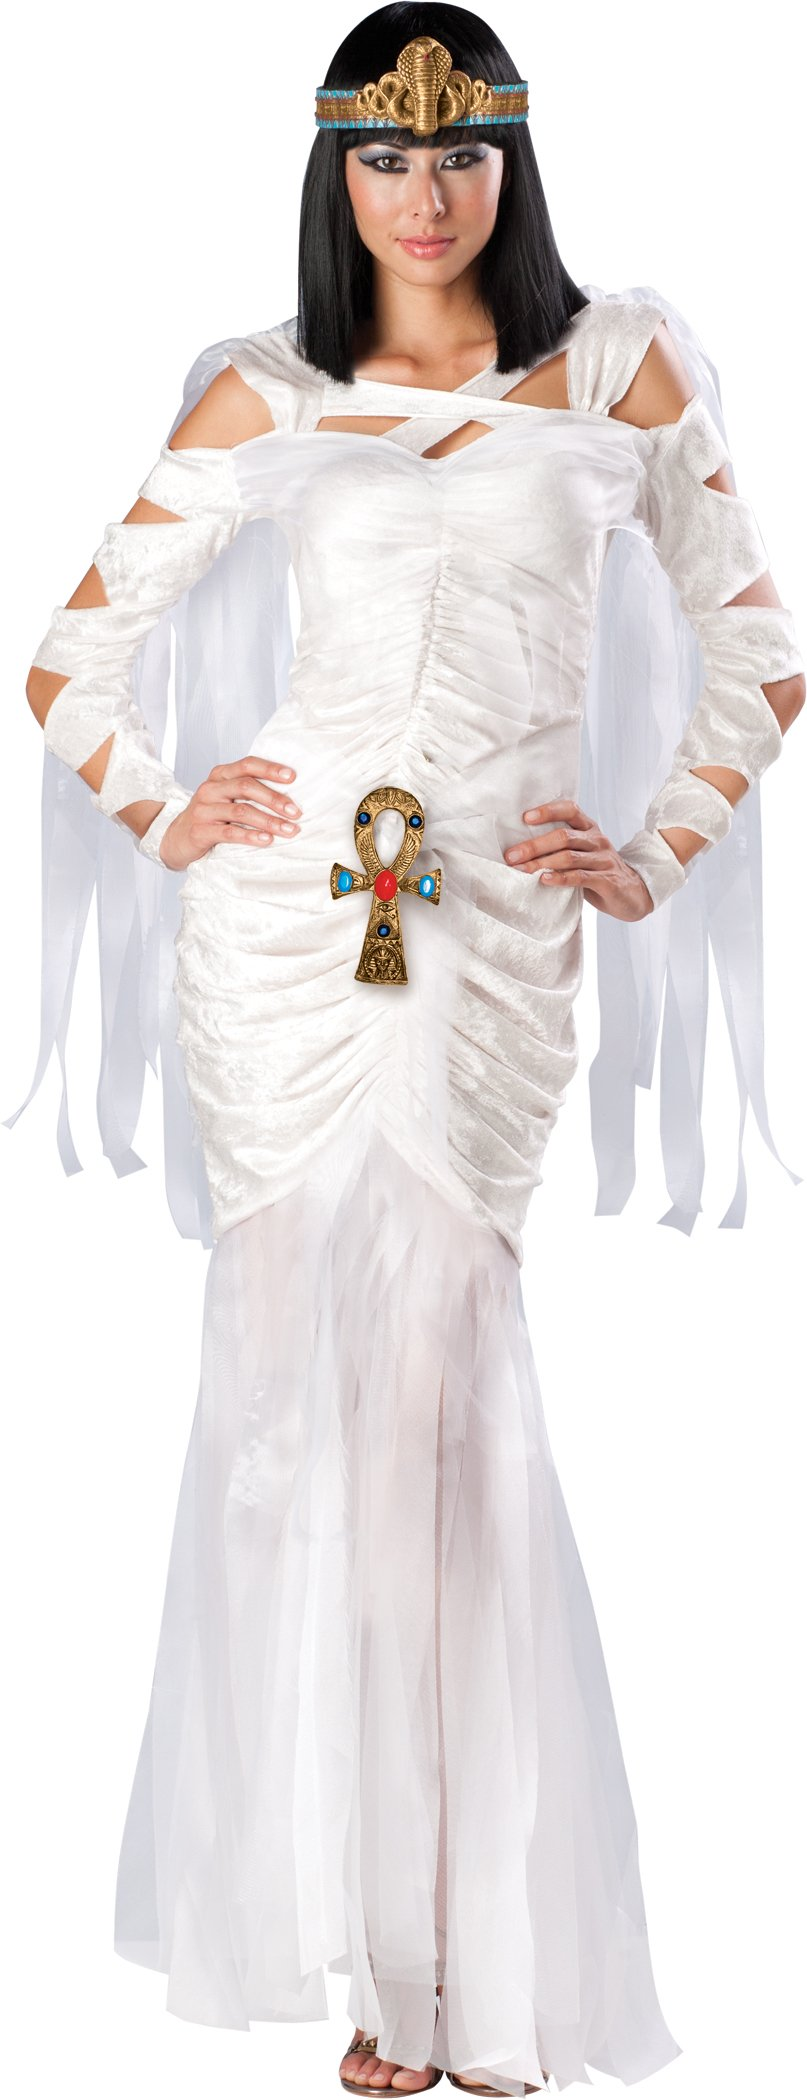 New Sexy Womens Egyptian Mummy Cleopatra Costume S Ebay